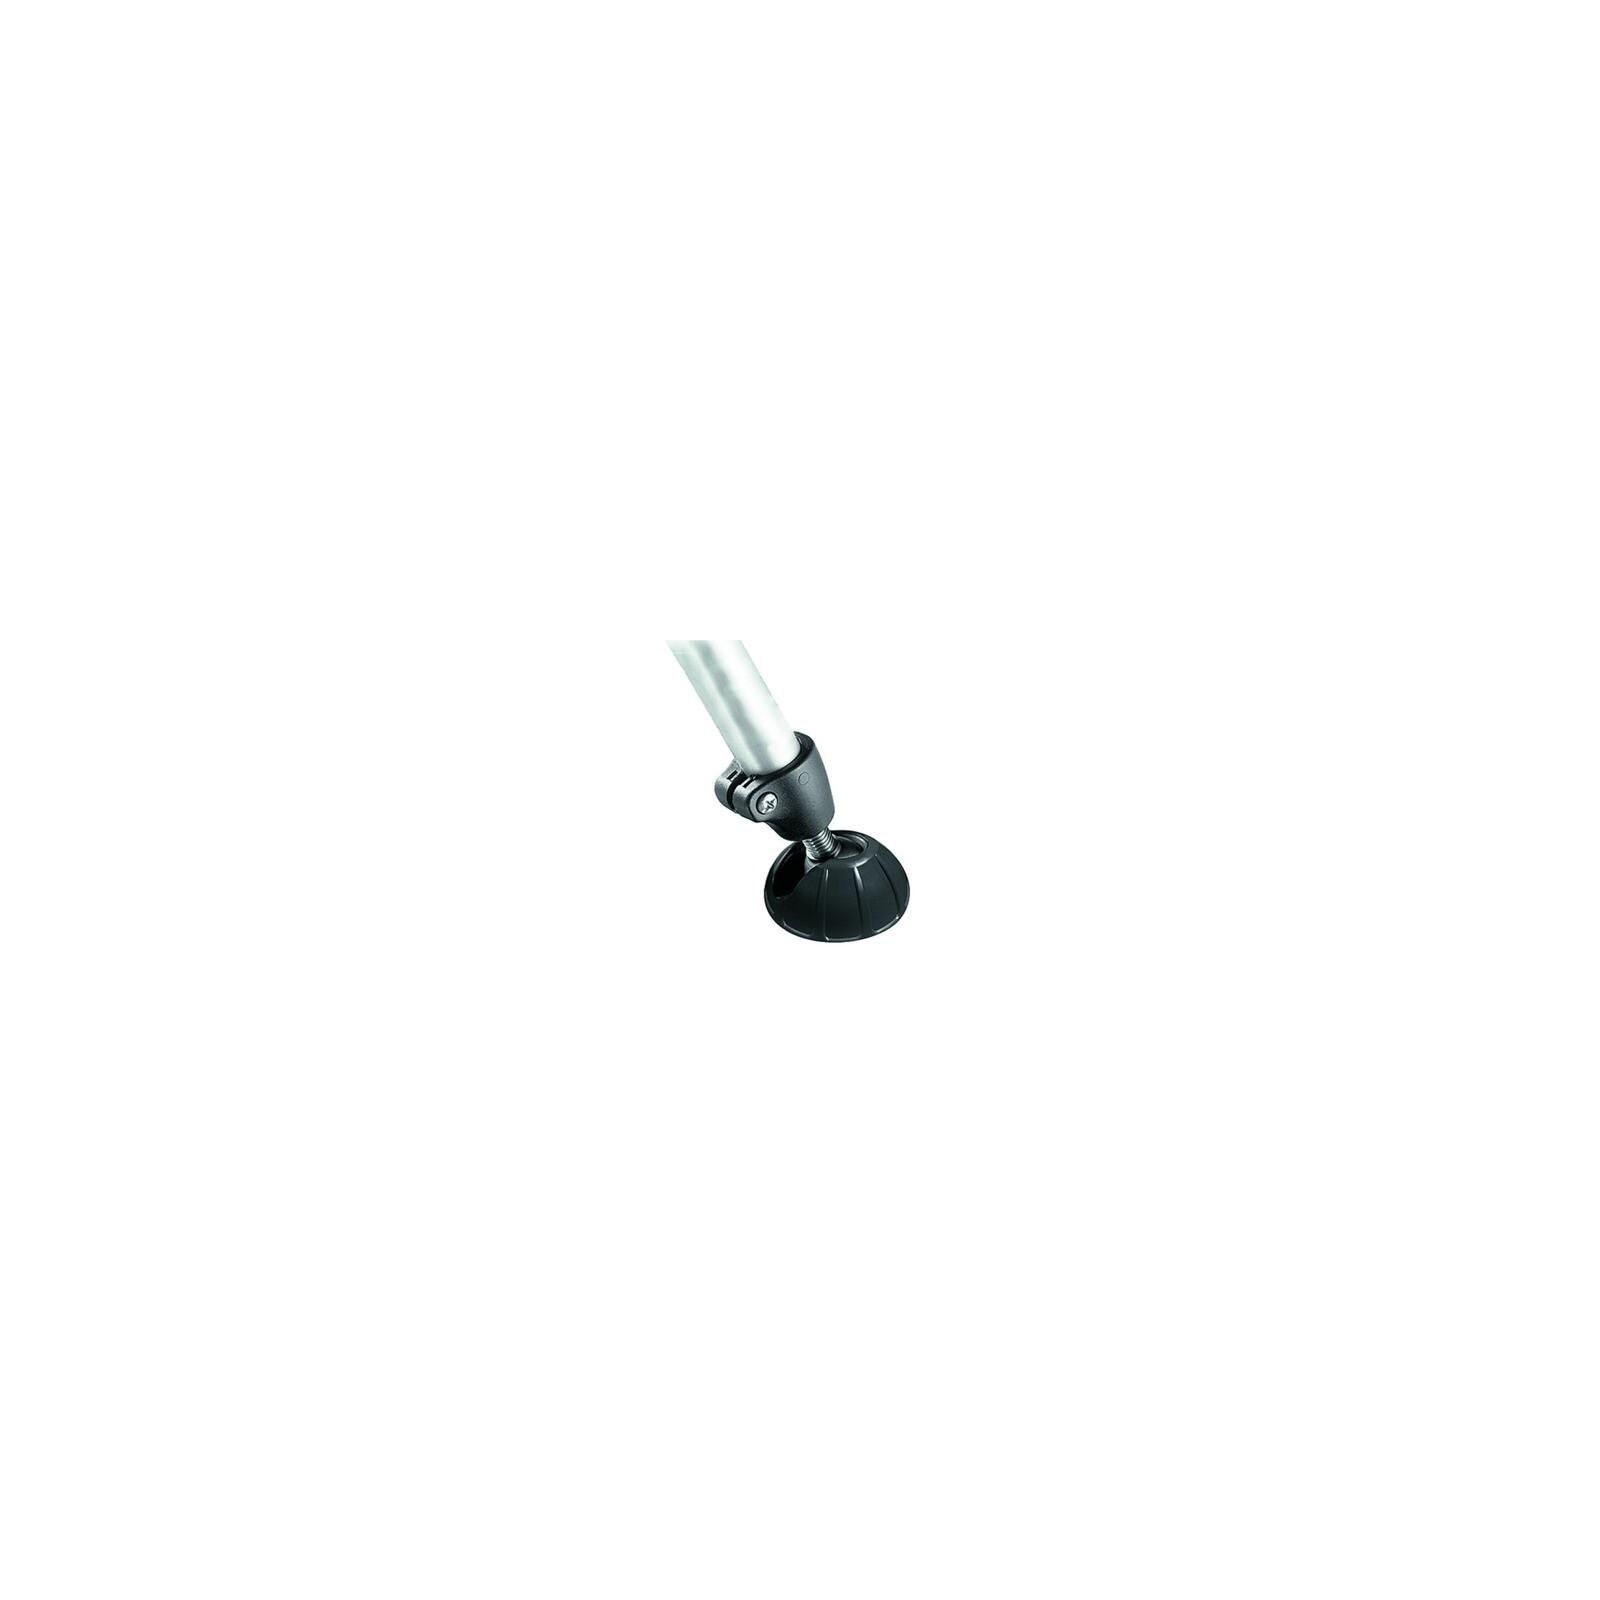 Manfrotto 116SC1 Saug/Spikefuß 11,6mm